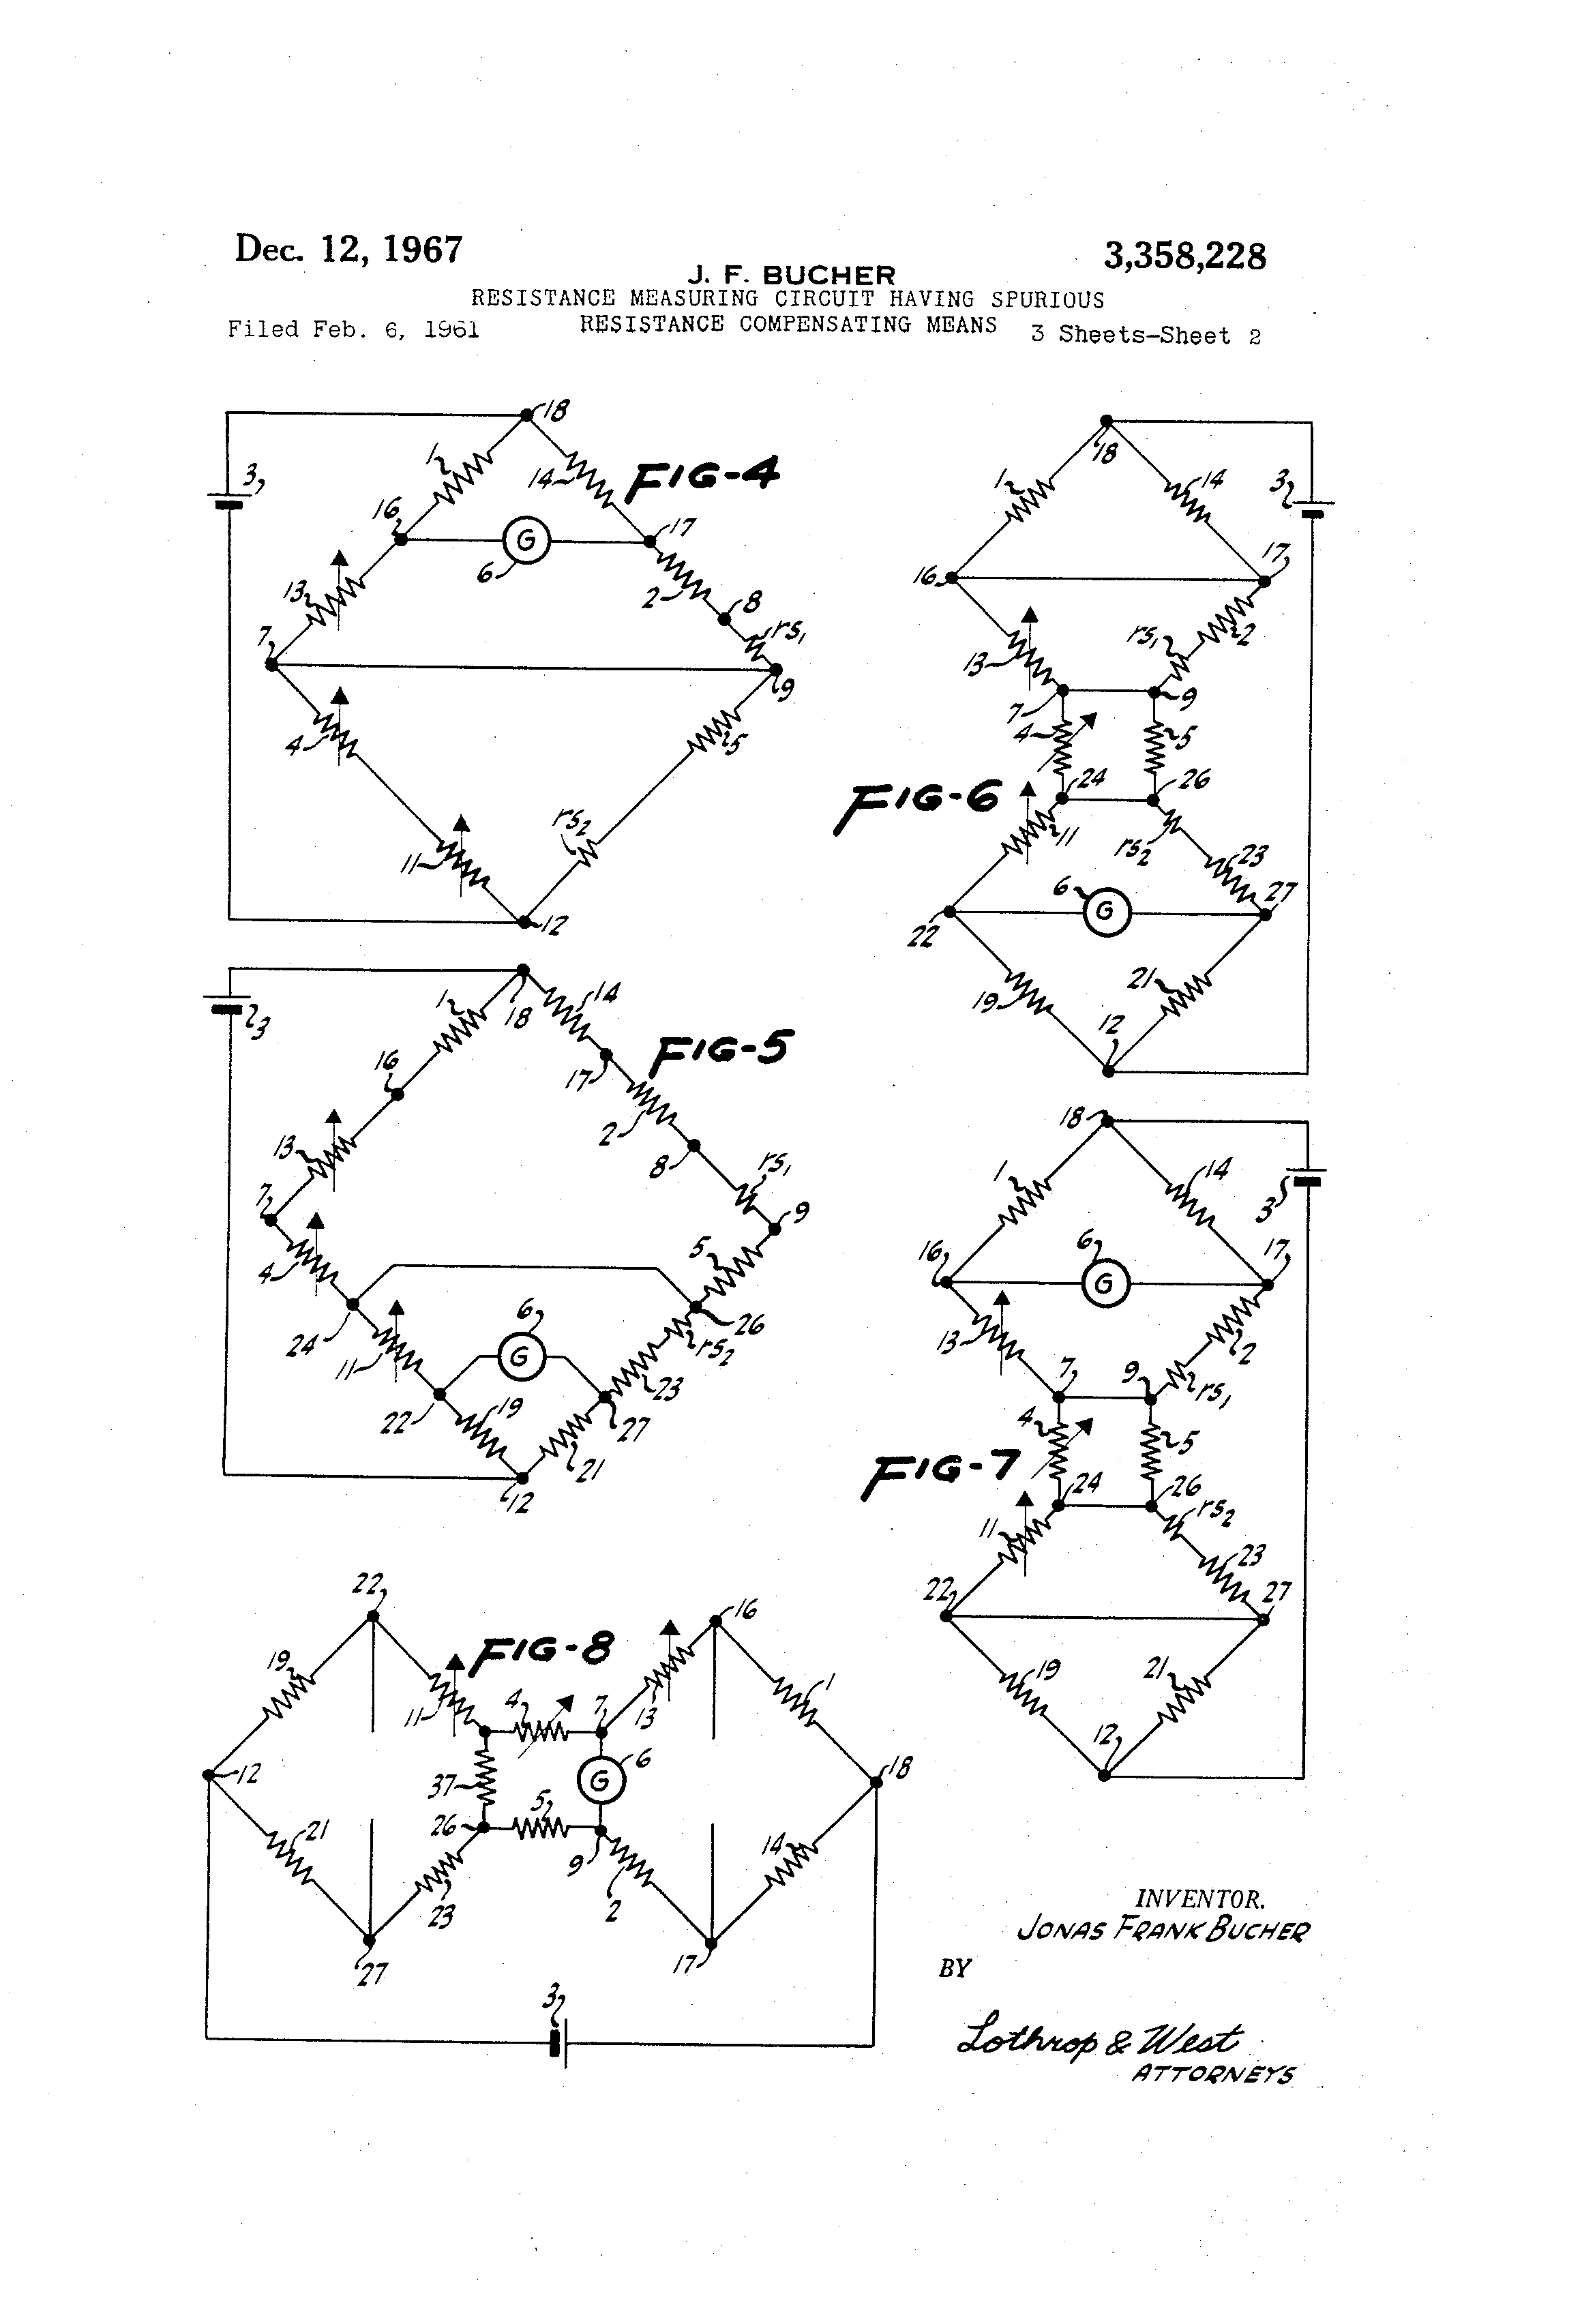 Patent Us3358228 Resistance Measuring Circuit Having Spurious Measurement Diagram Drawing